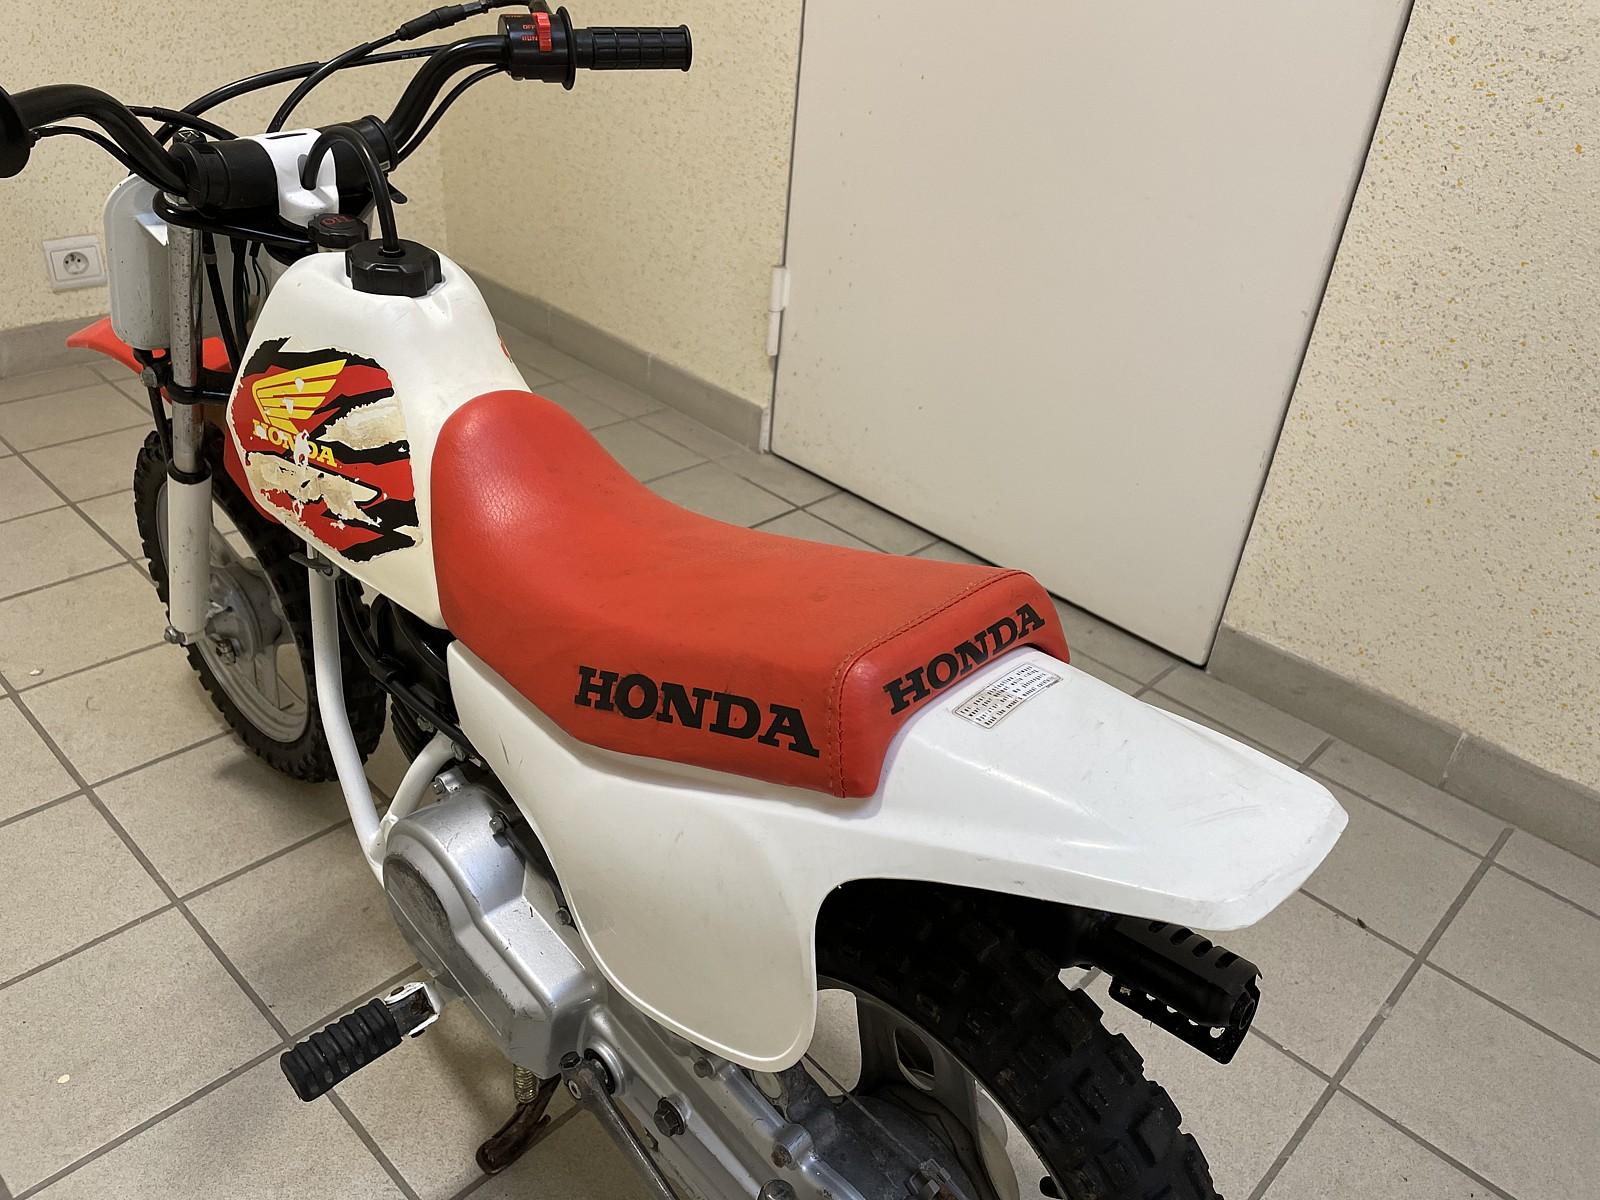 F1804C41-DE8D-4DD2-A95D-2B9D12653BD3 - Godcho - Motocross Pictures - Vital MX